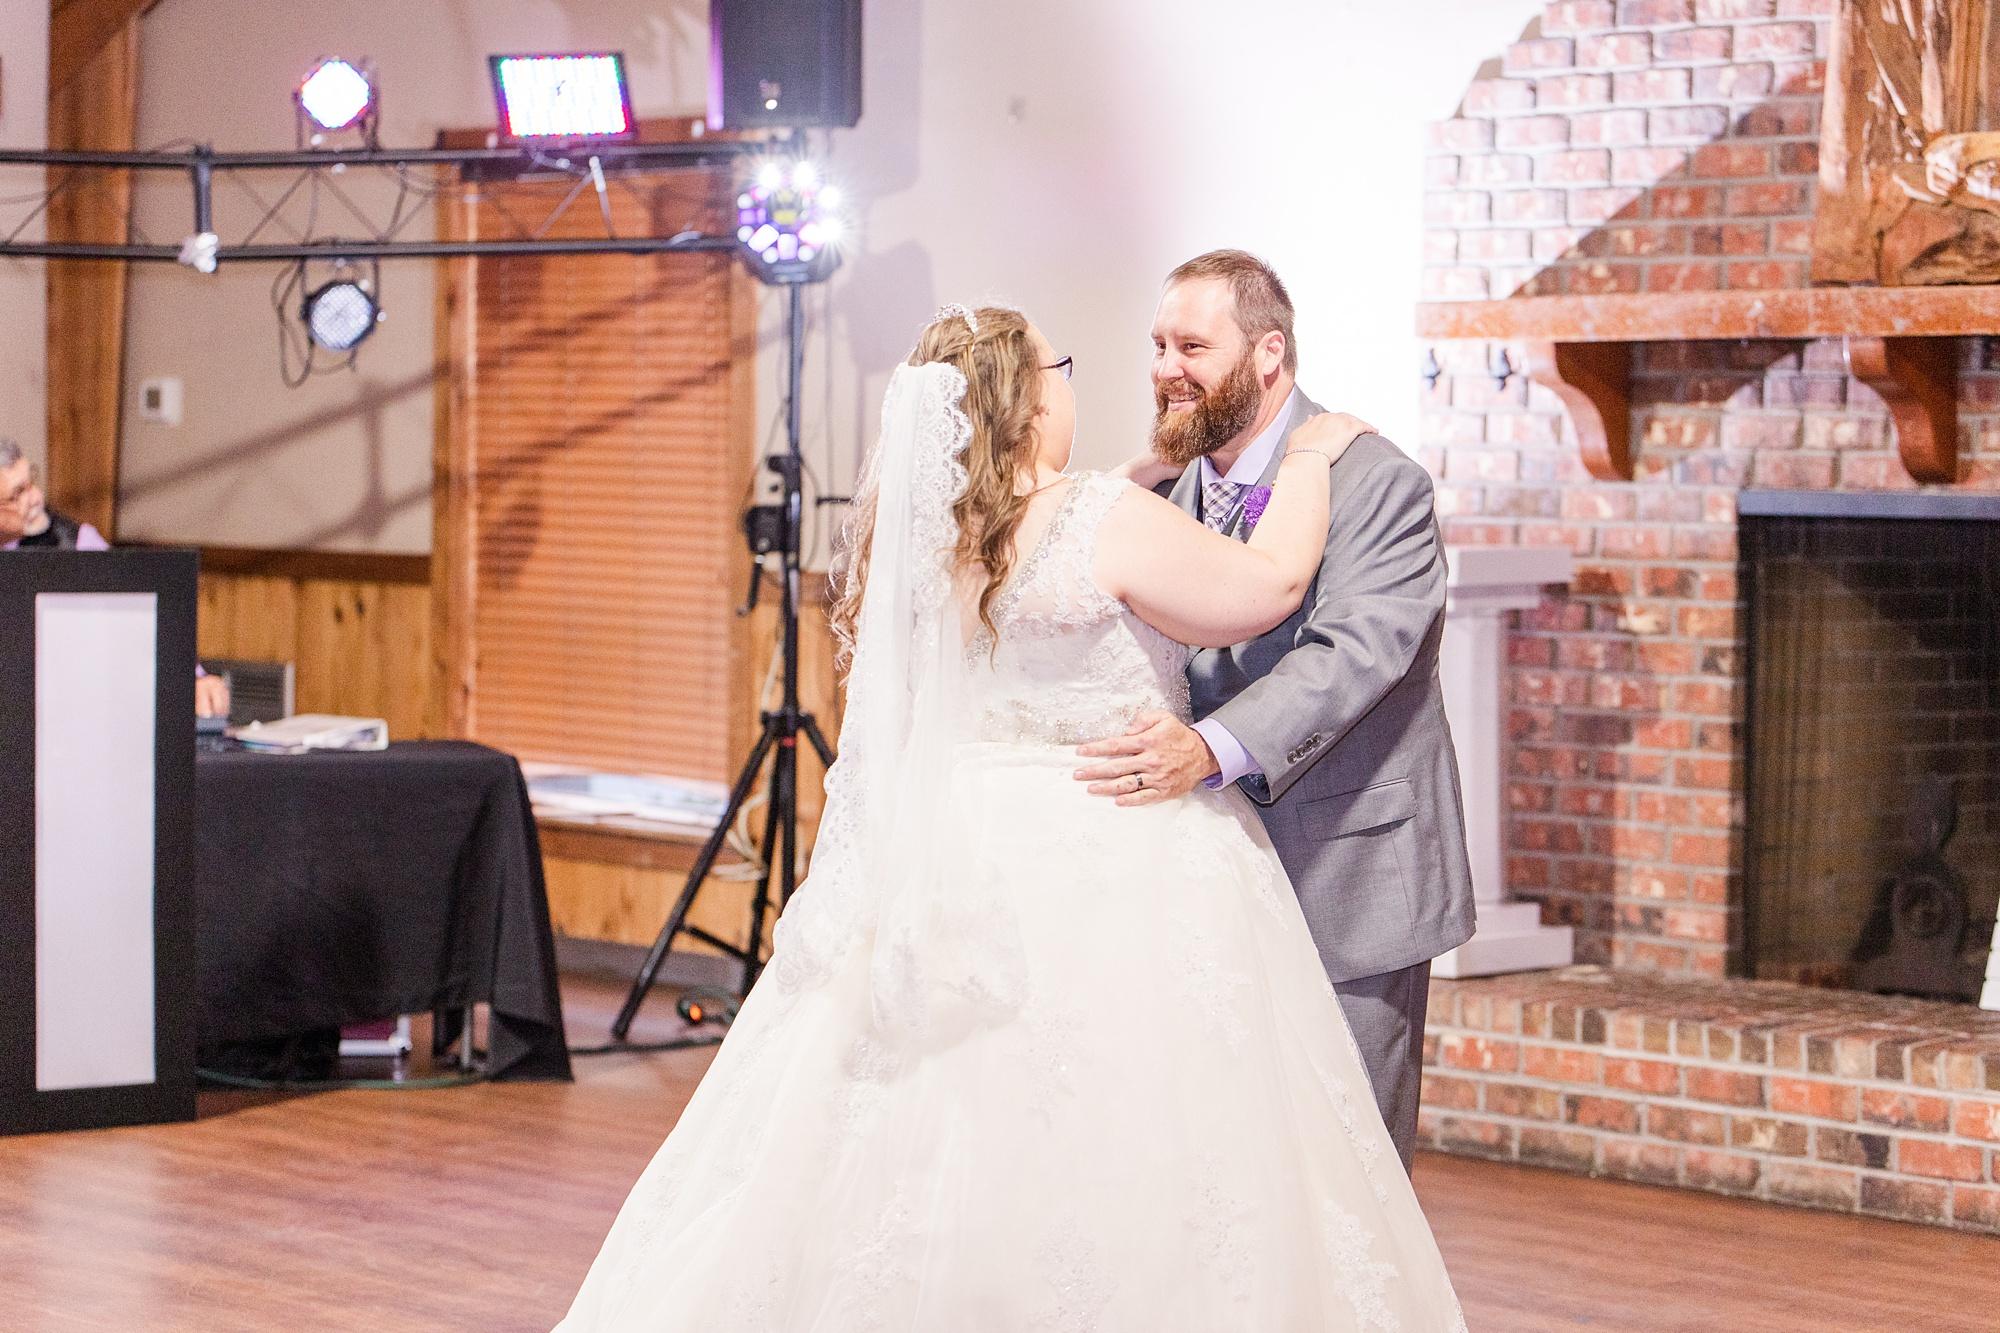 bride and groom dance during intimate Satsuma wedding reception